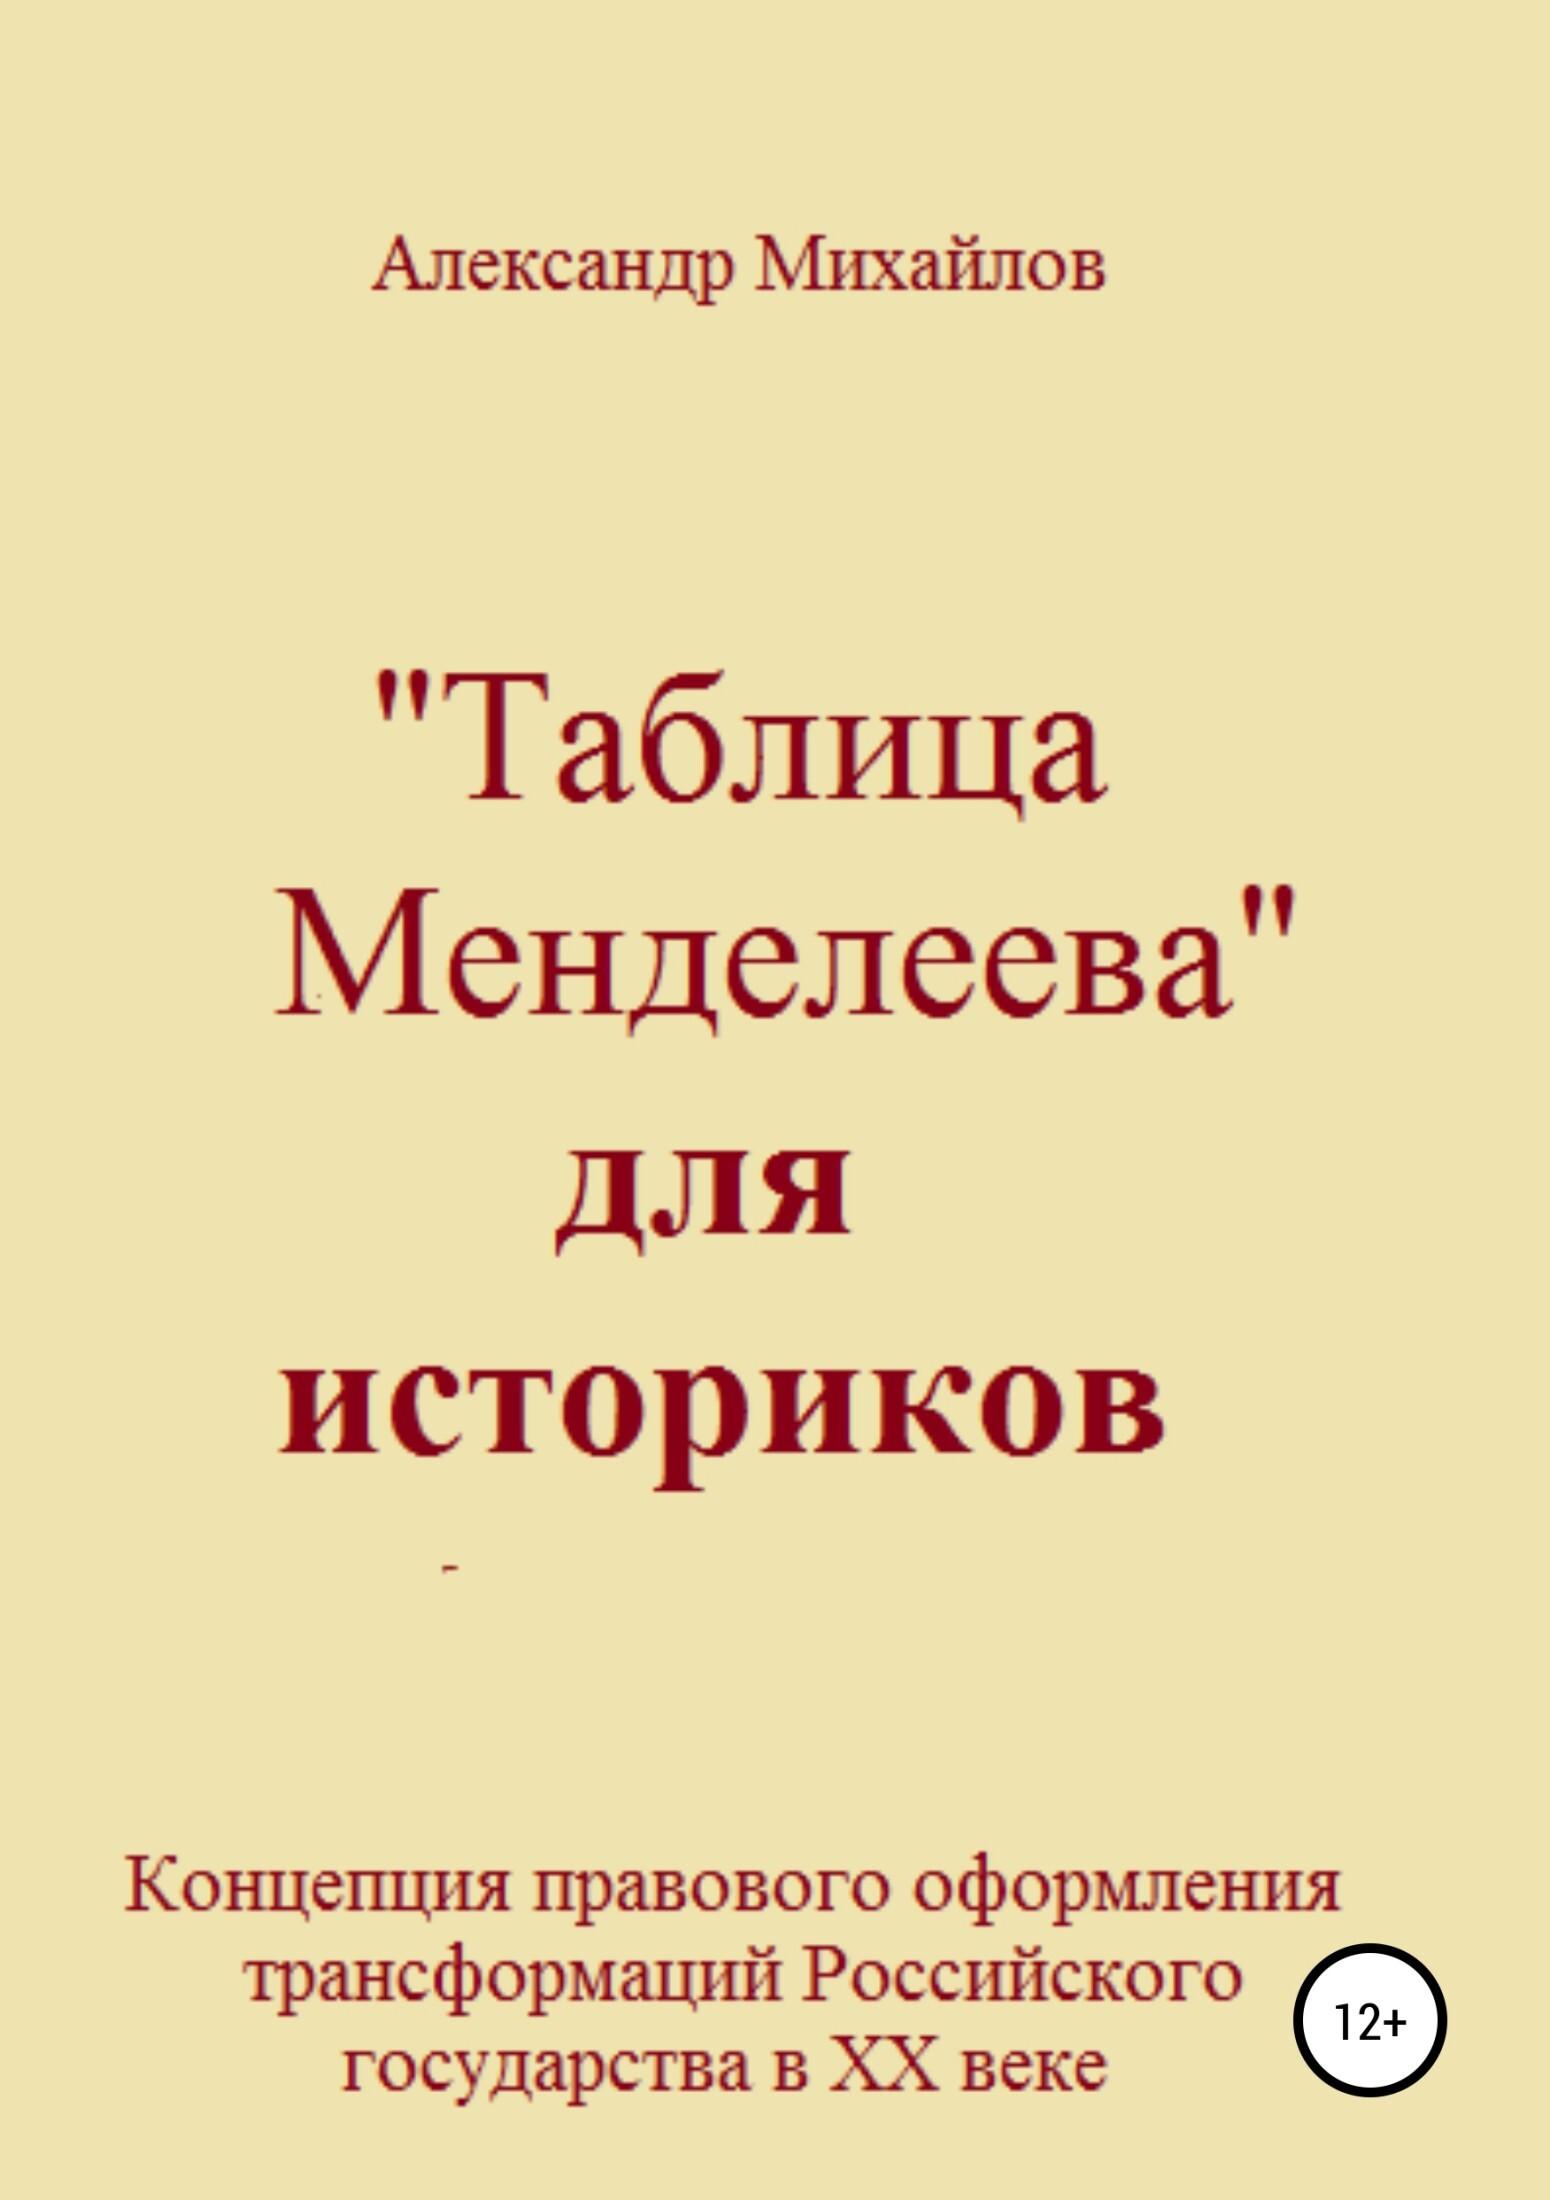 Александр Григорьевич Михайлов «Таблица Менделеева» для историков